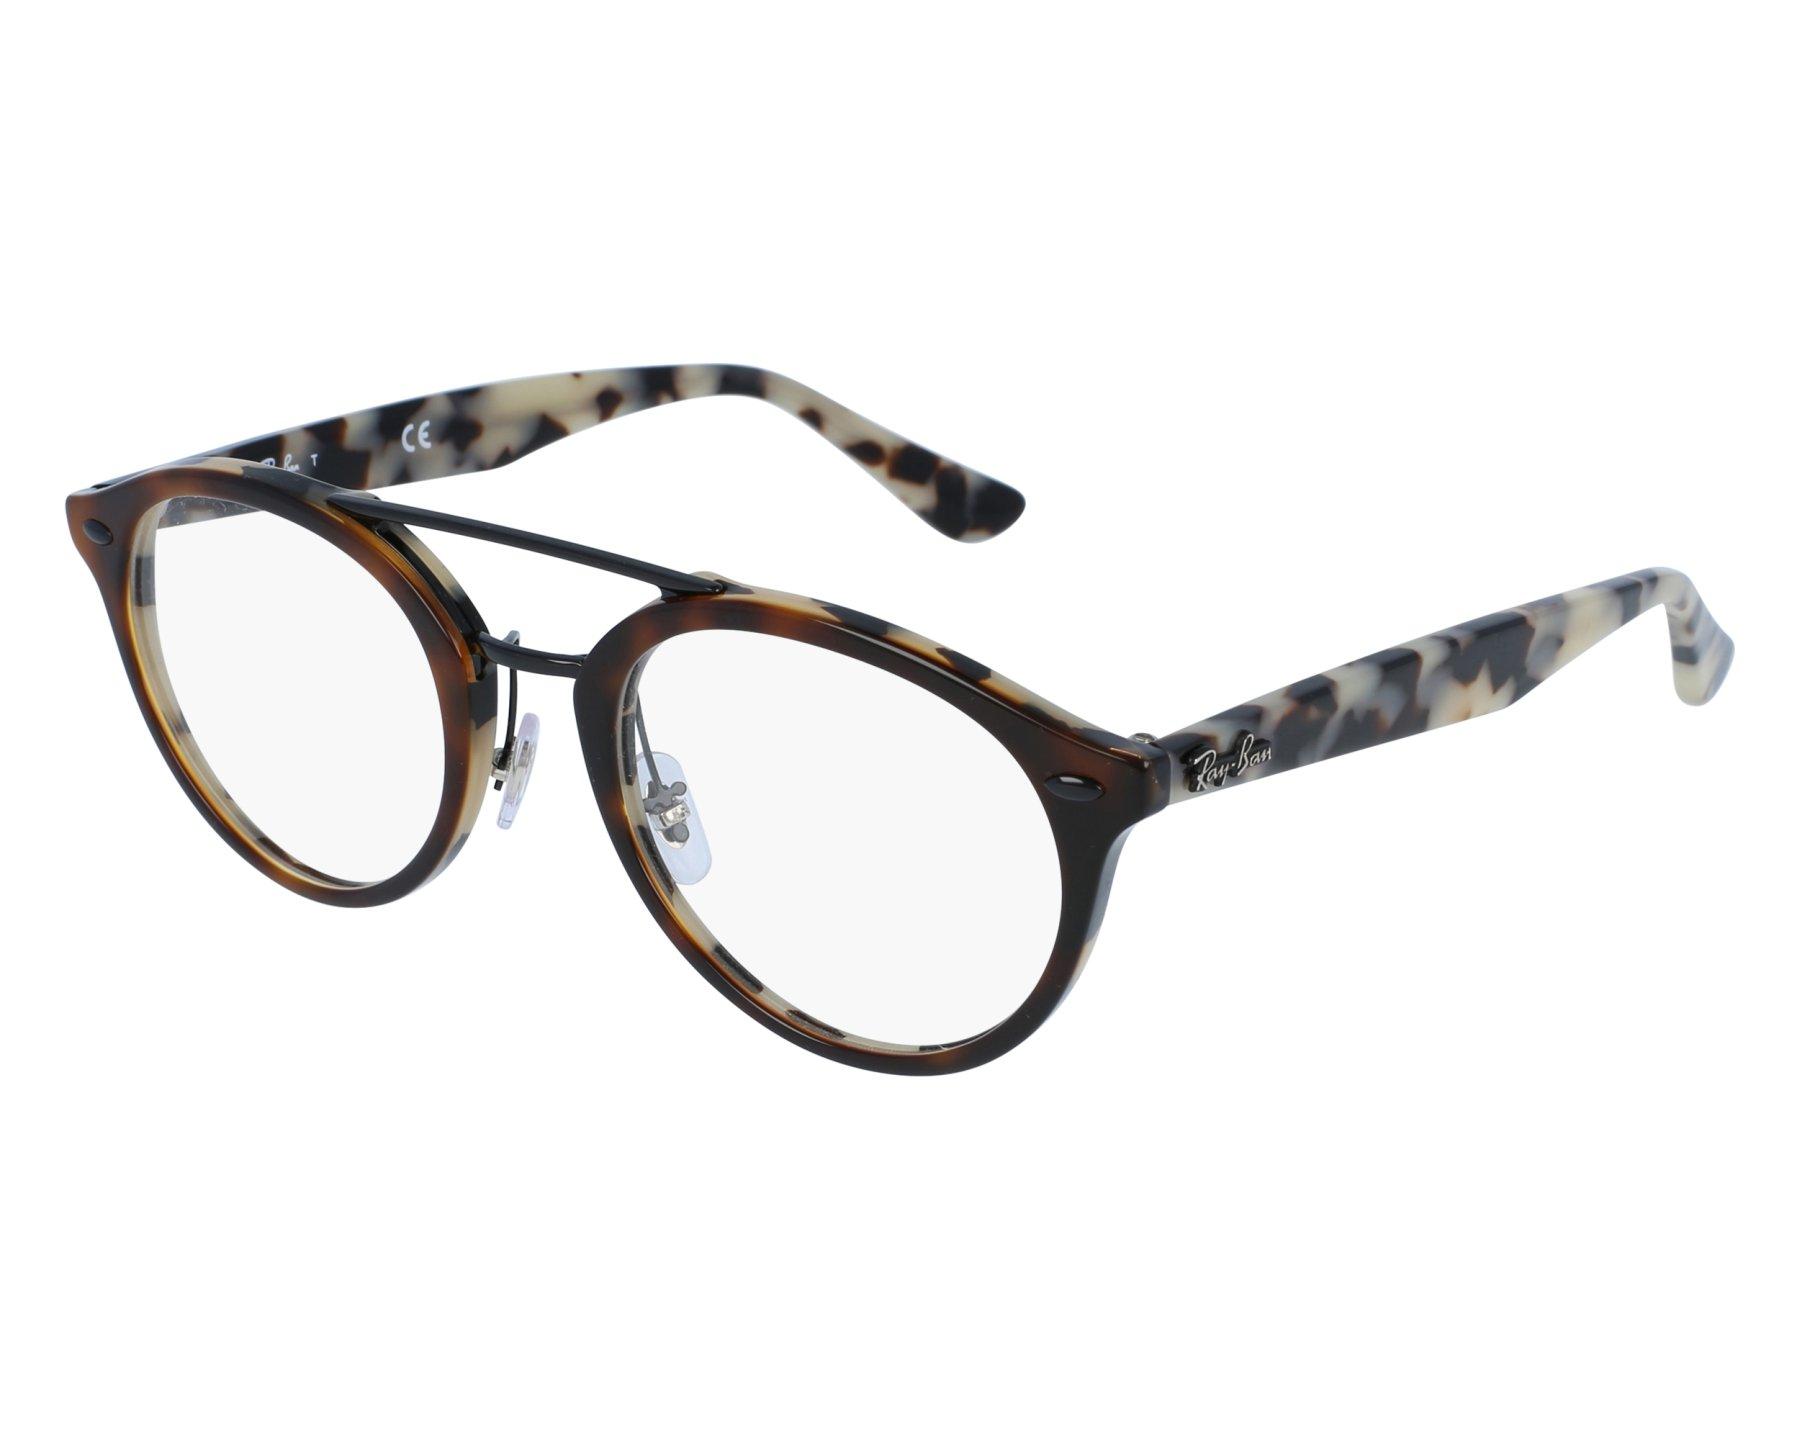 9723a7e6304cea eyeglasses Ray-Ban RX-5354 5676 48-21 Havana Black front view